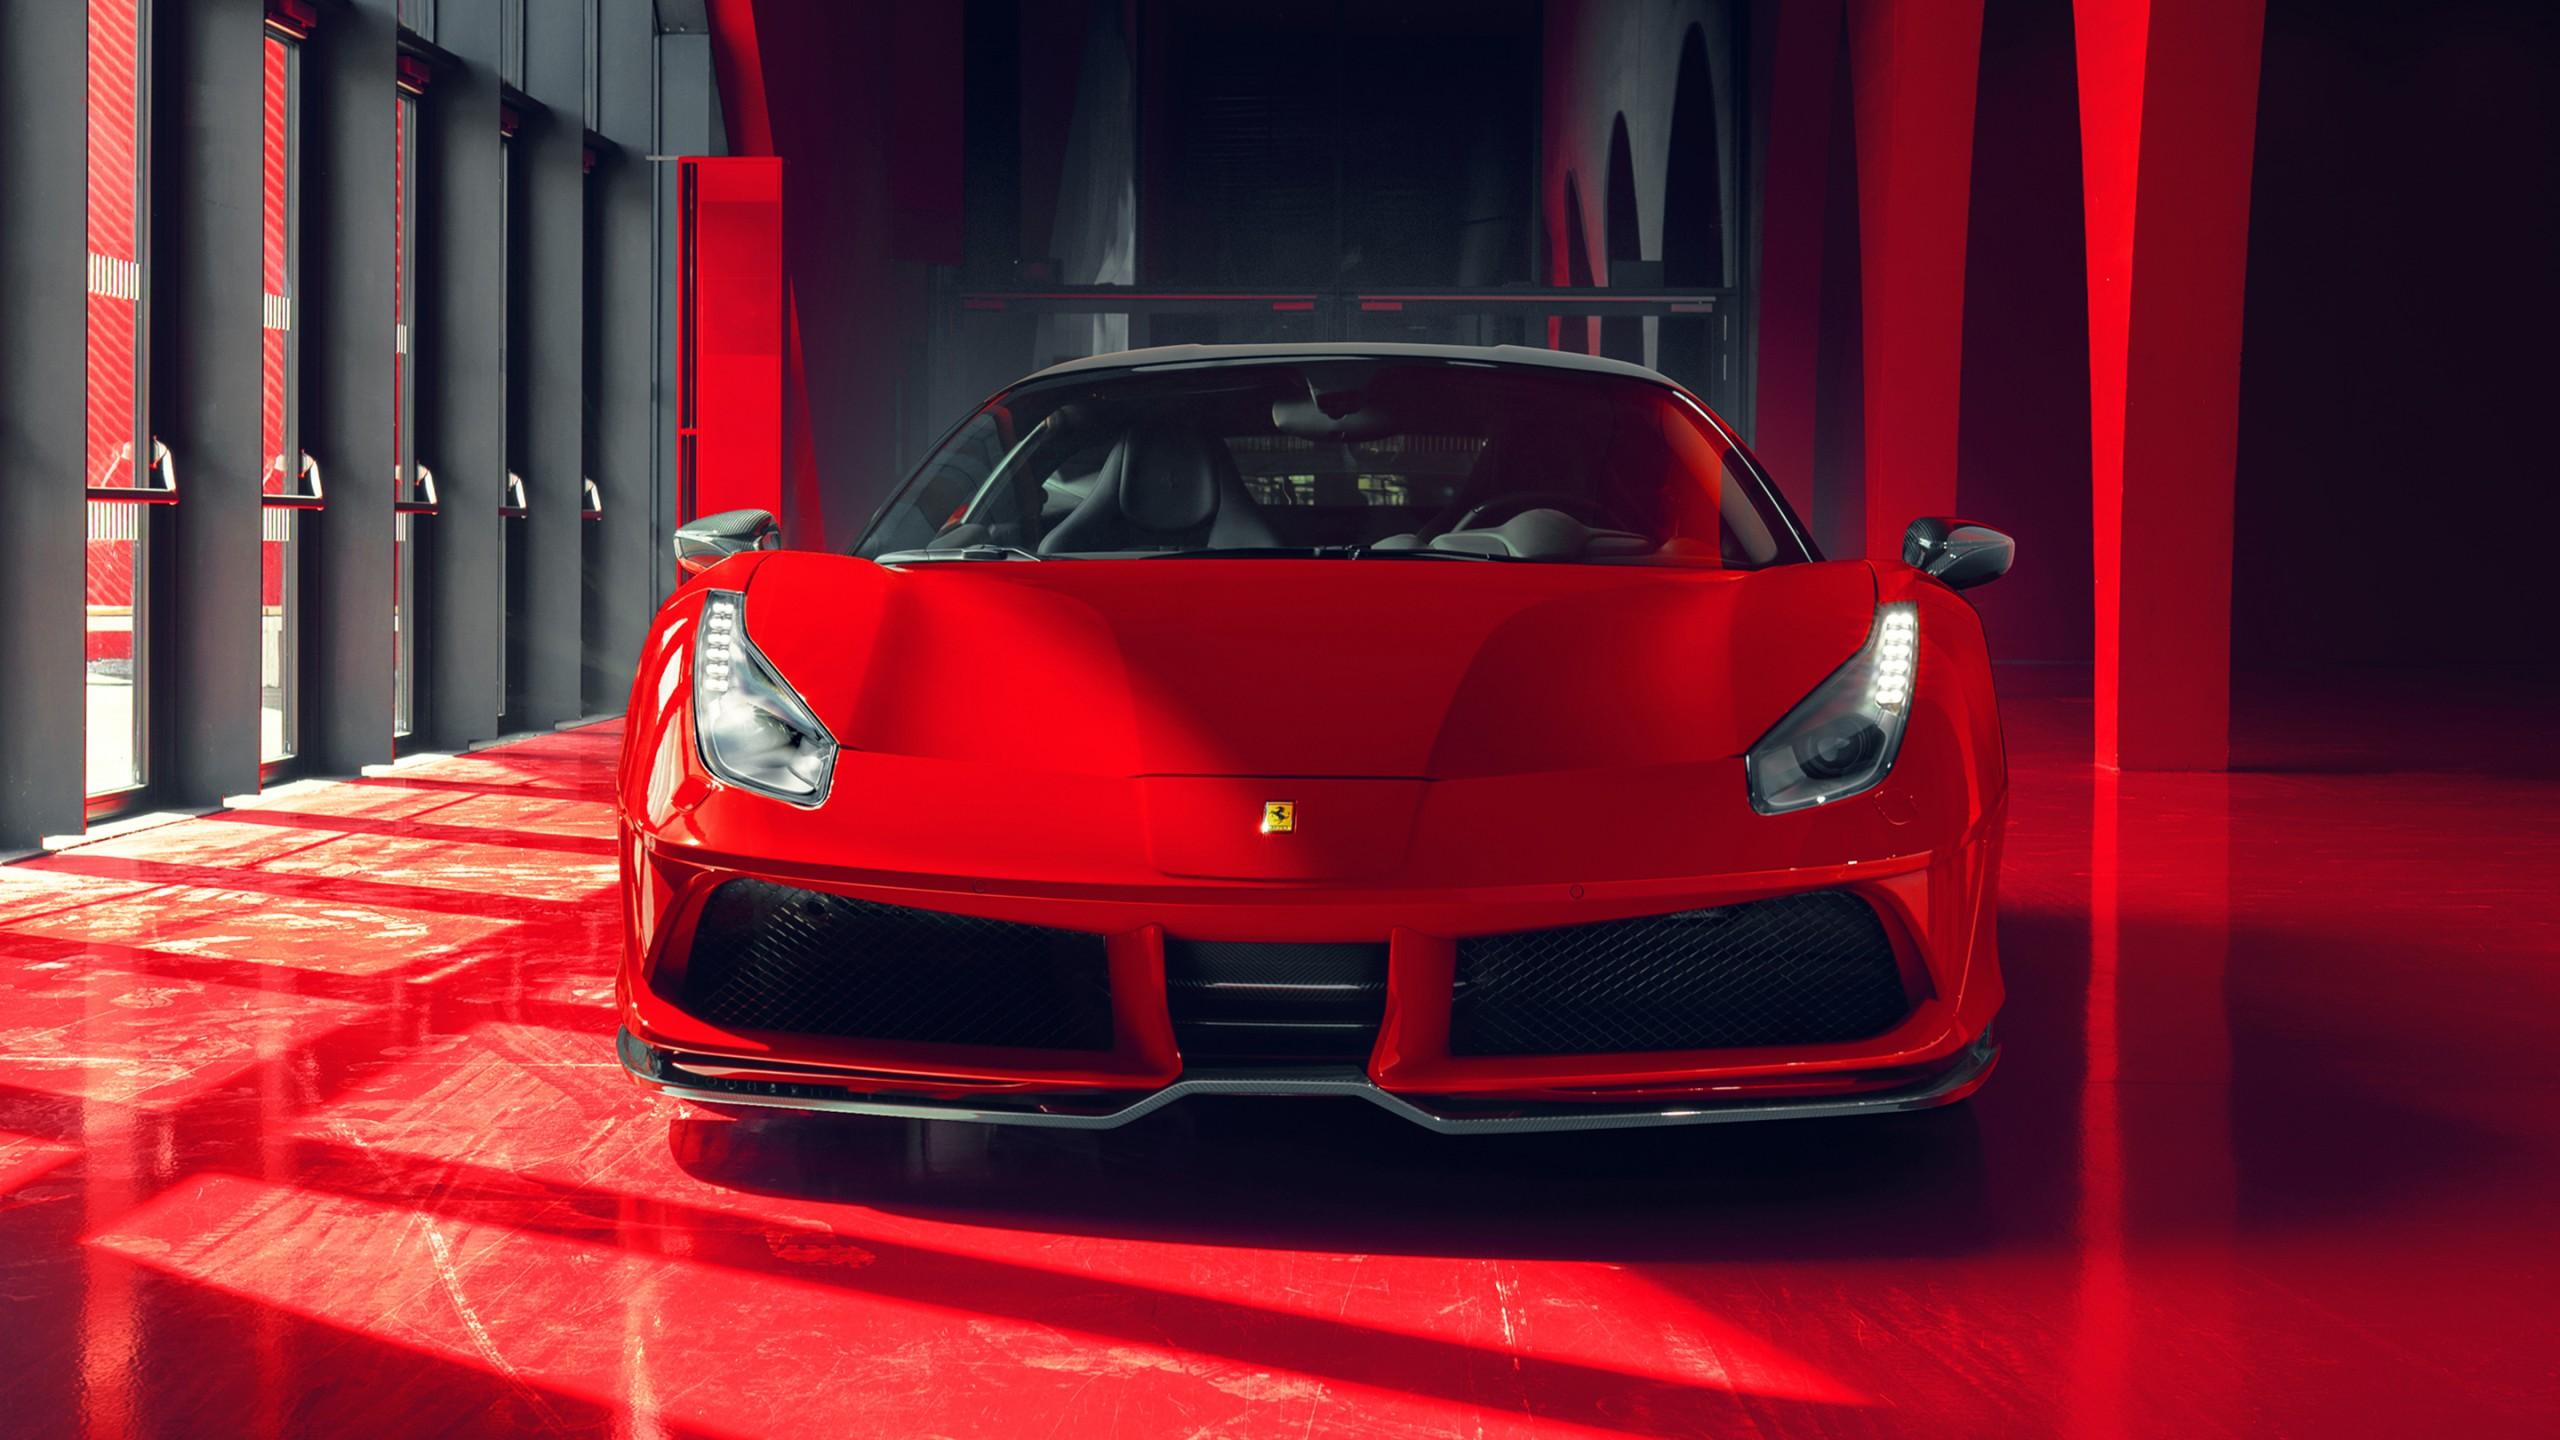 2018 Pogea Racing FPlus Corsa Ferrari 488 GTB Wallpaper ...